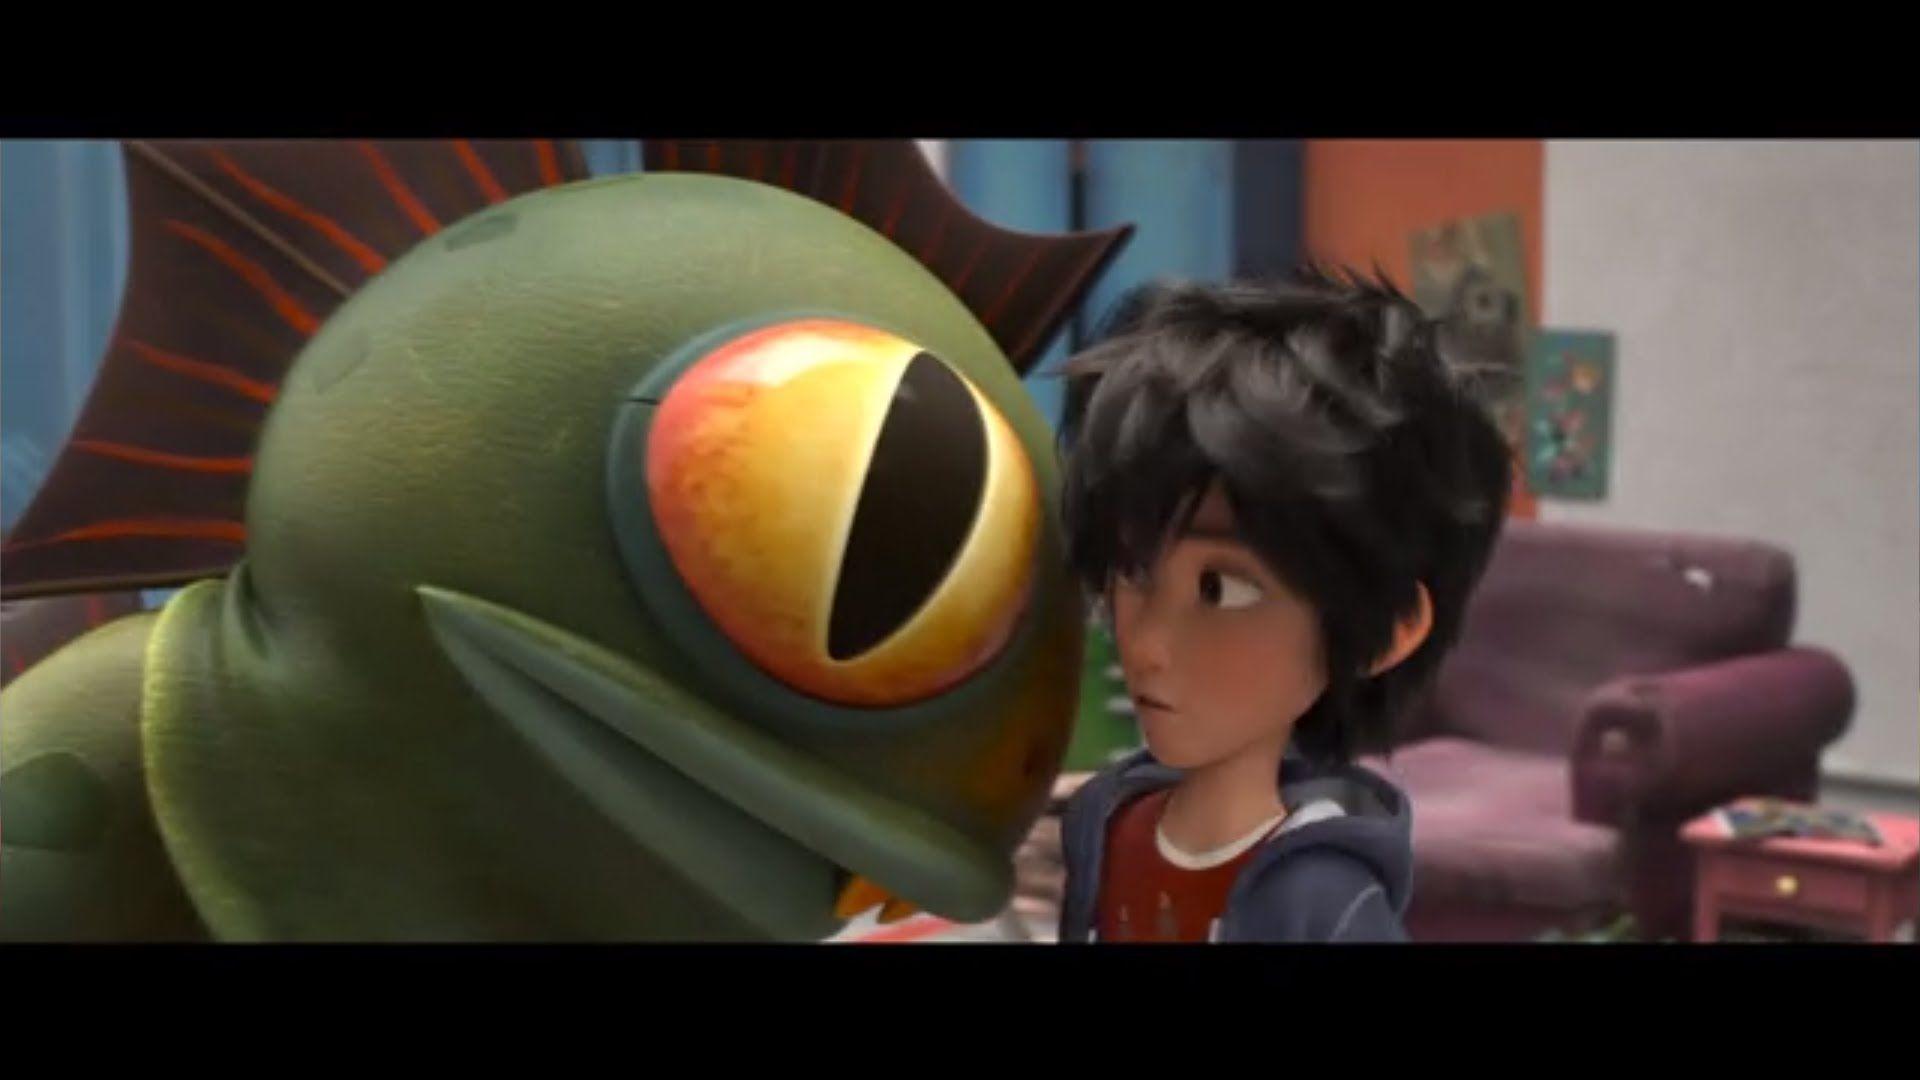 BIG HERO 6 Movie Clip - Meet Fred (2014) Disney Animation Movie